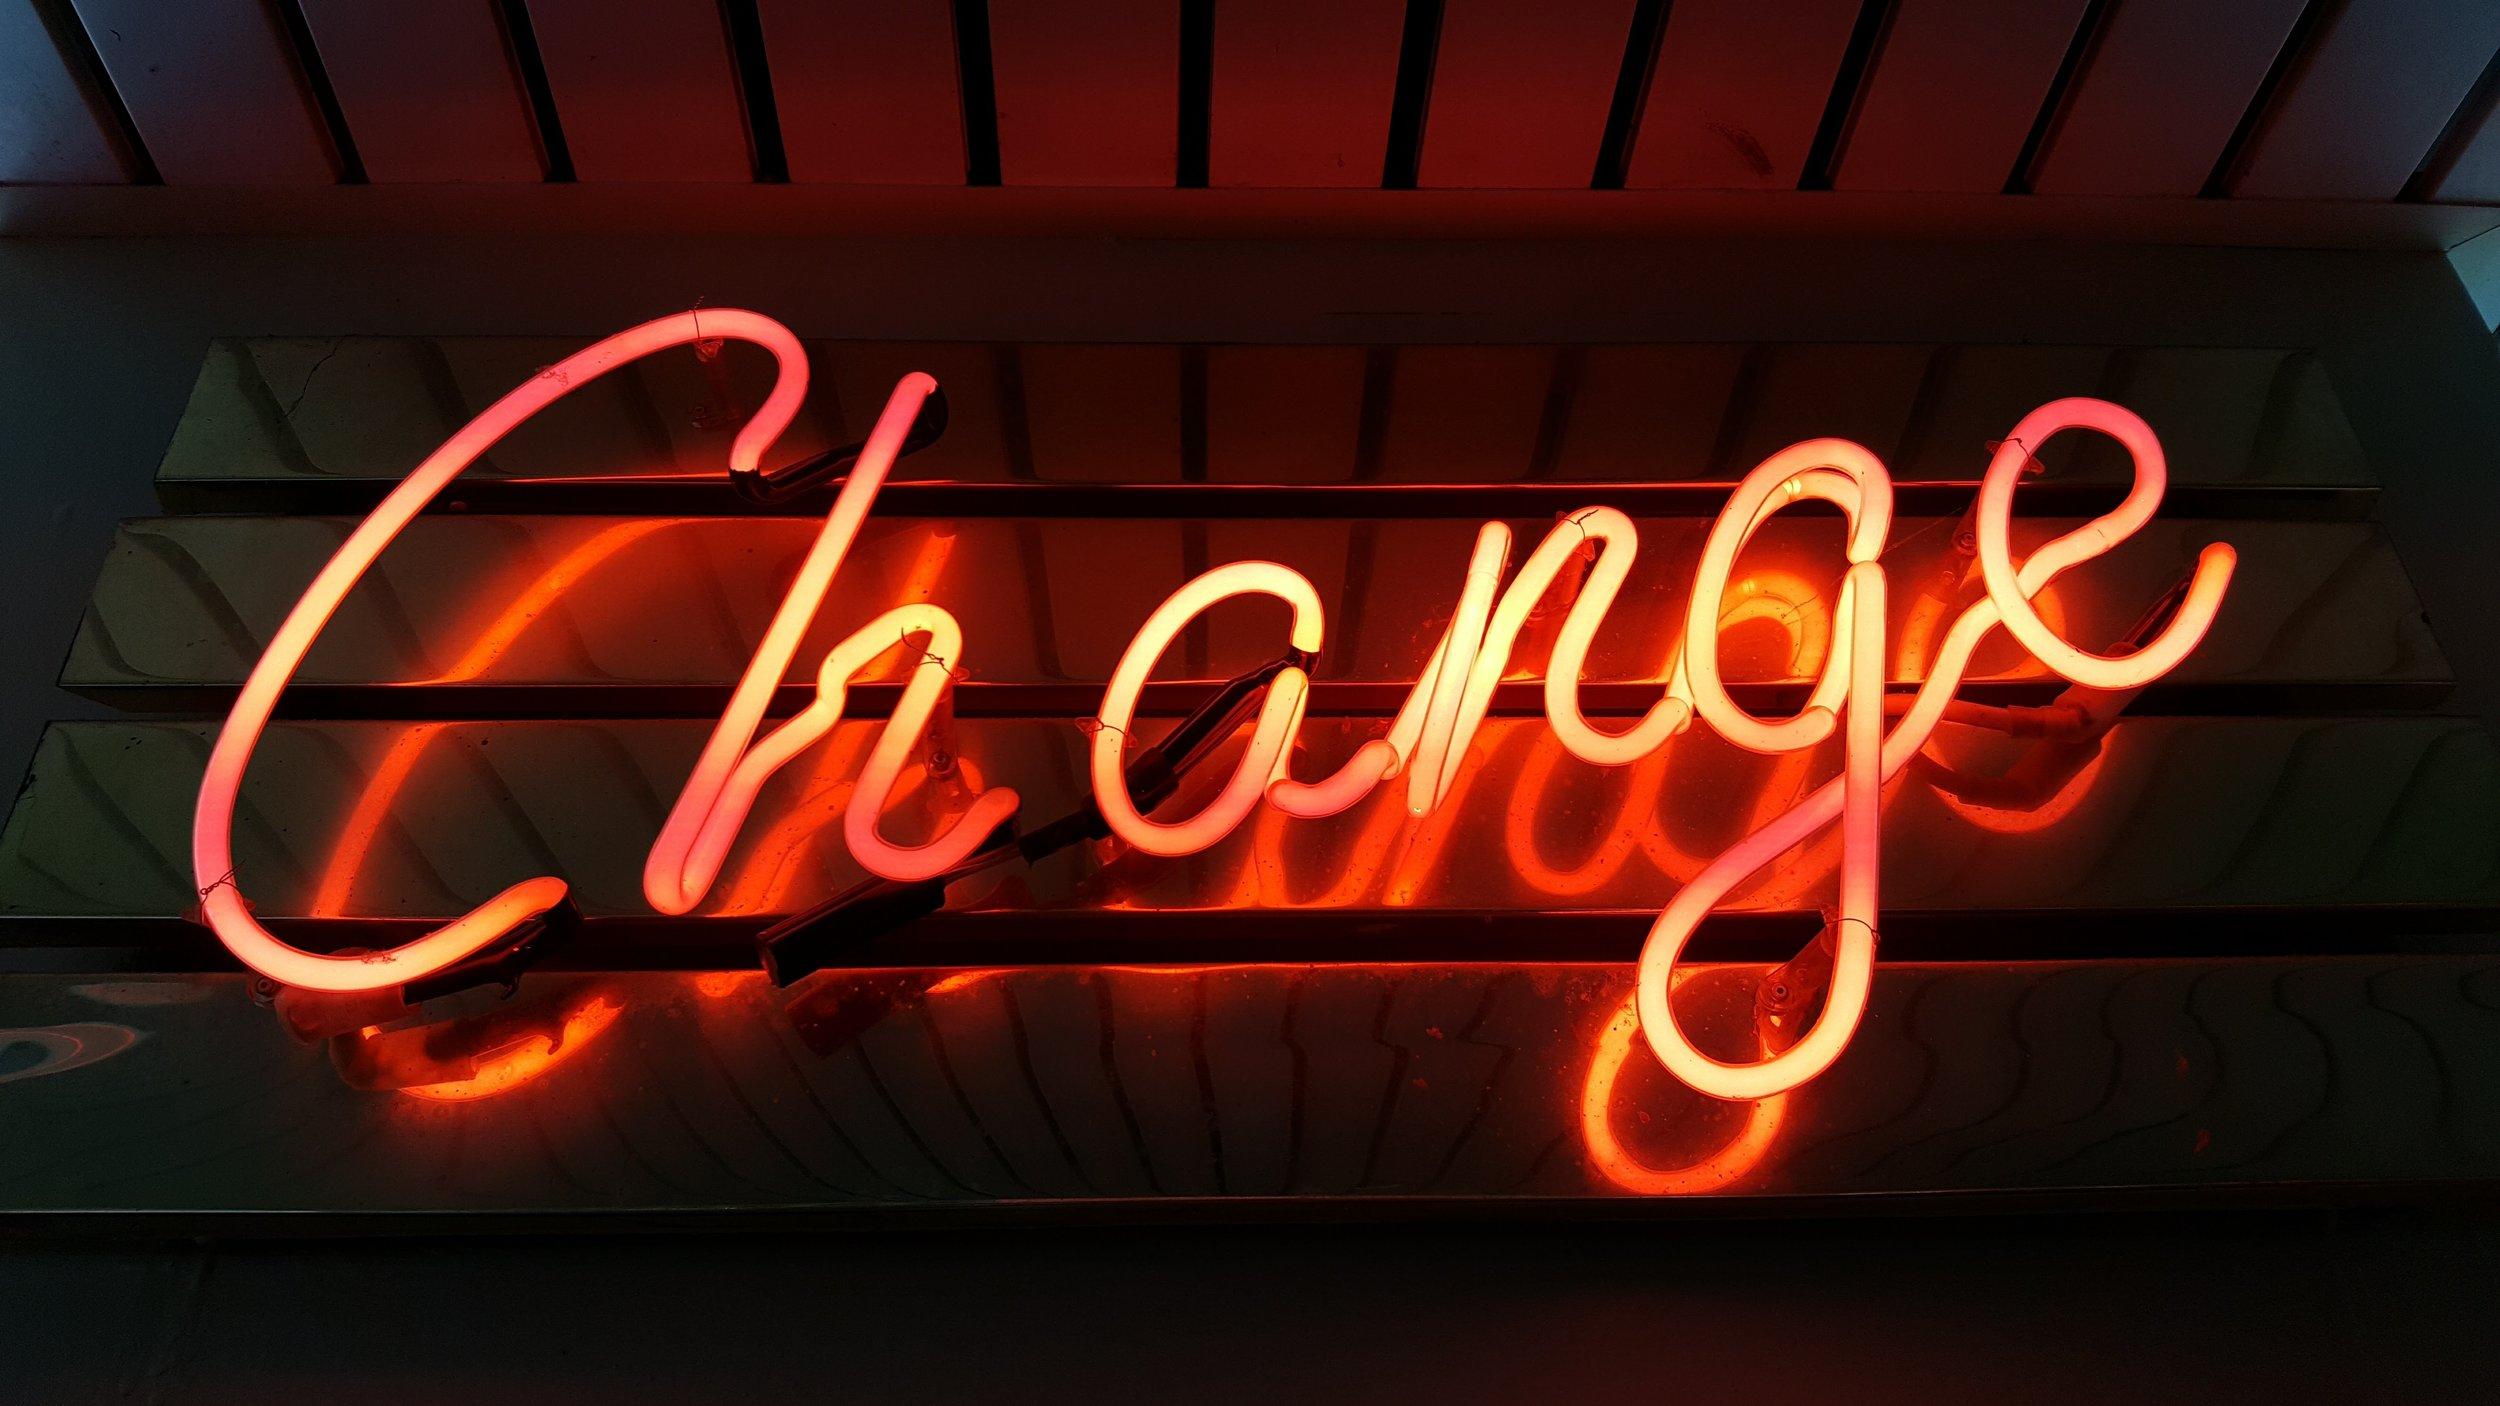 Change_stock image_unsplash.jpg